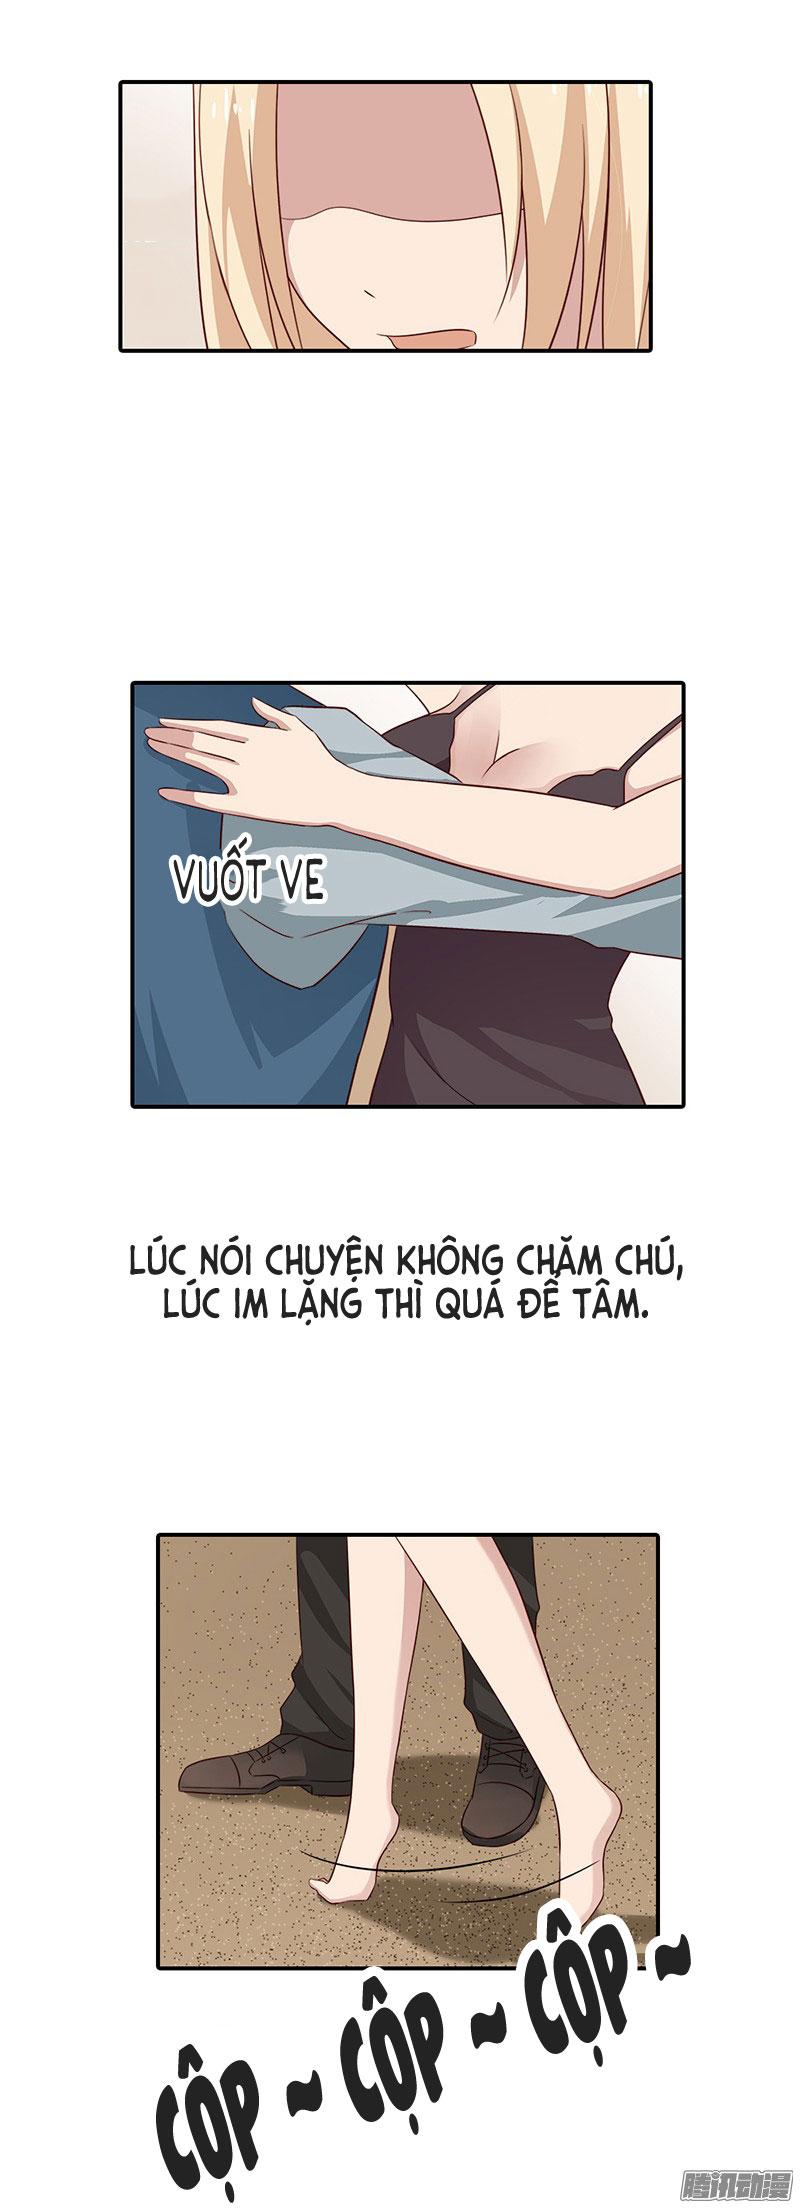 Bạn Trai Minh Tinh Bức Yêu Chap 29 - Next Chap 30